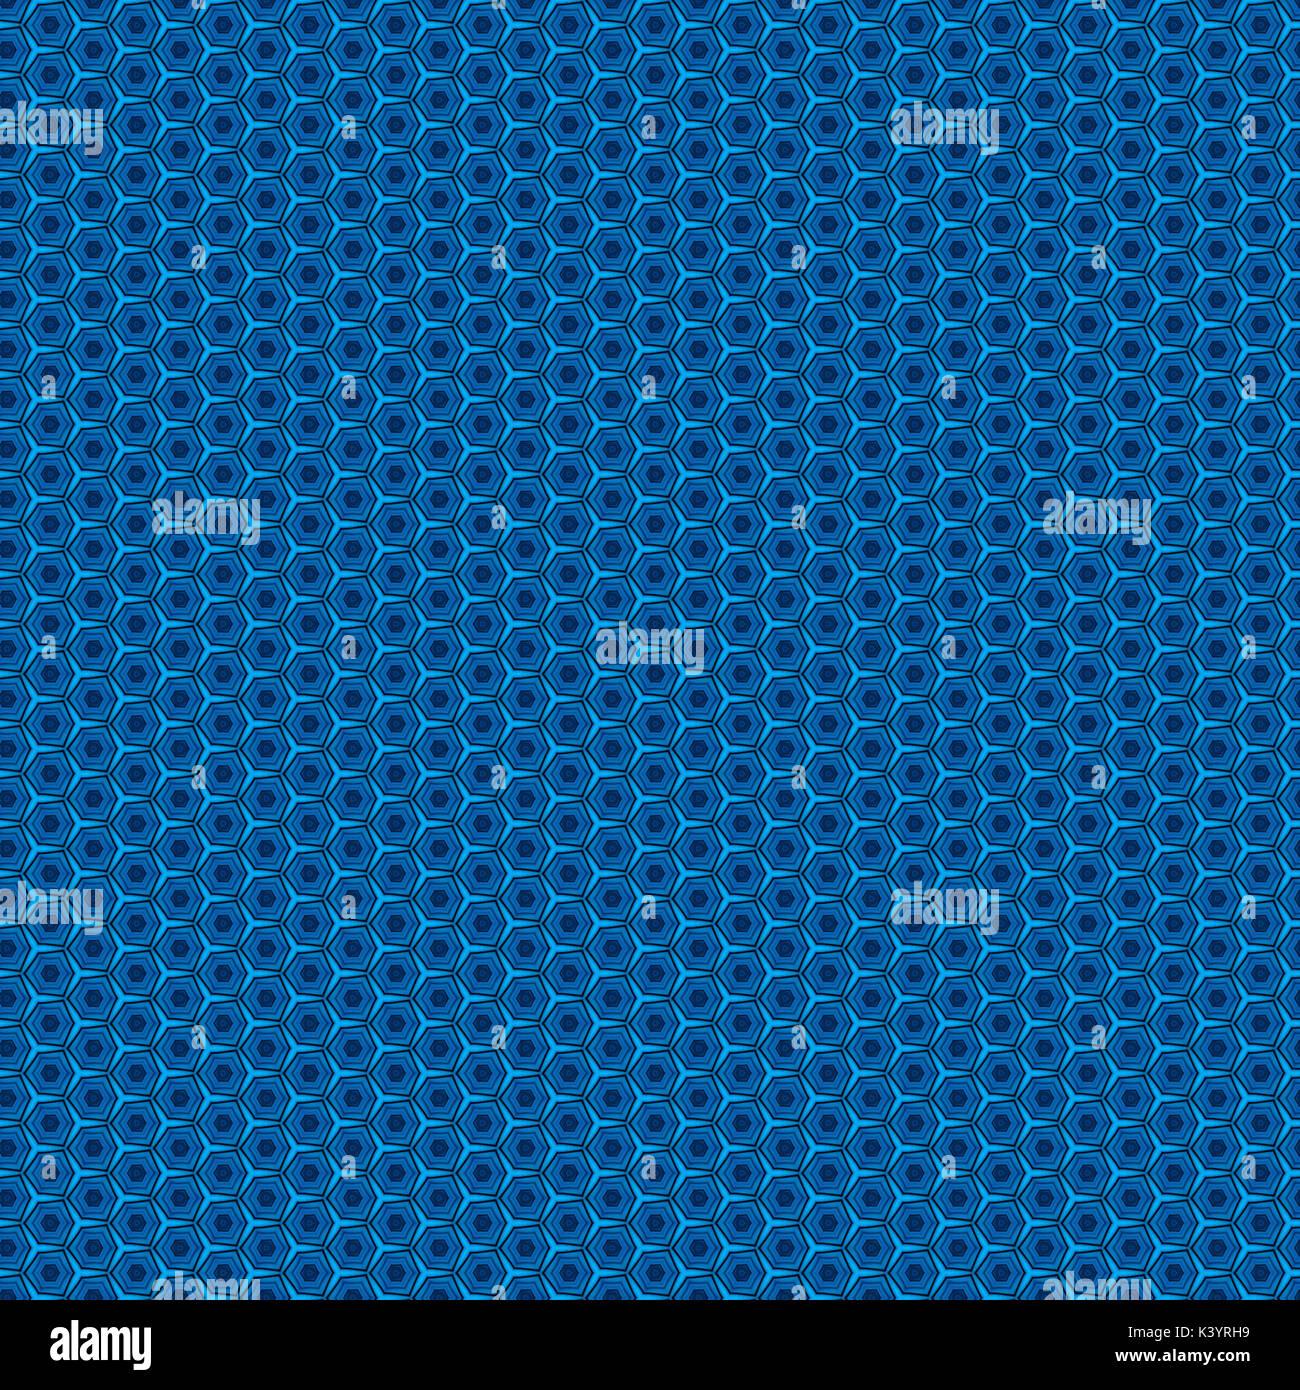 Geometric Peacock Blue PatternStock Photo